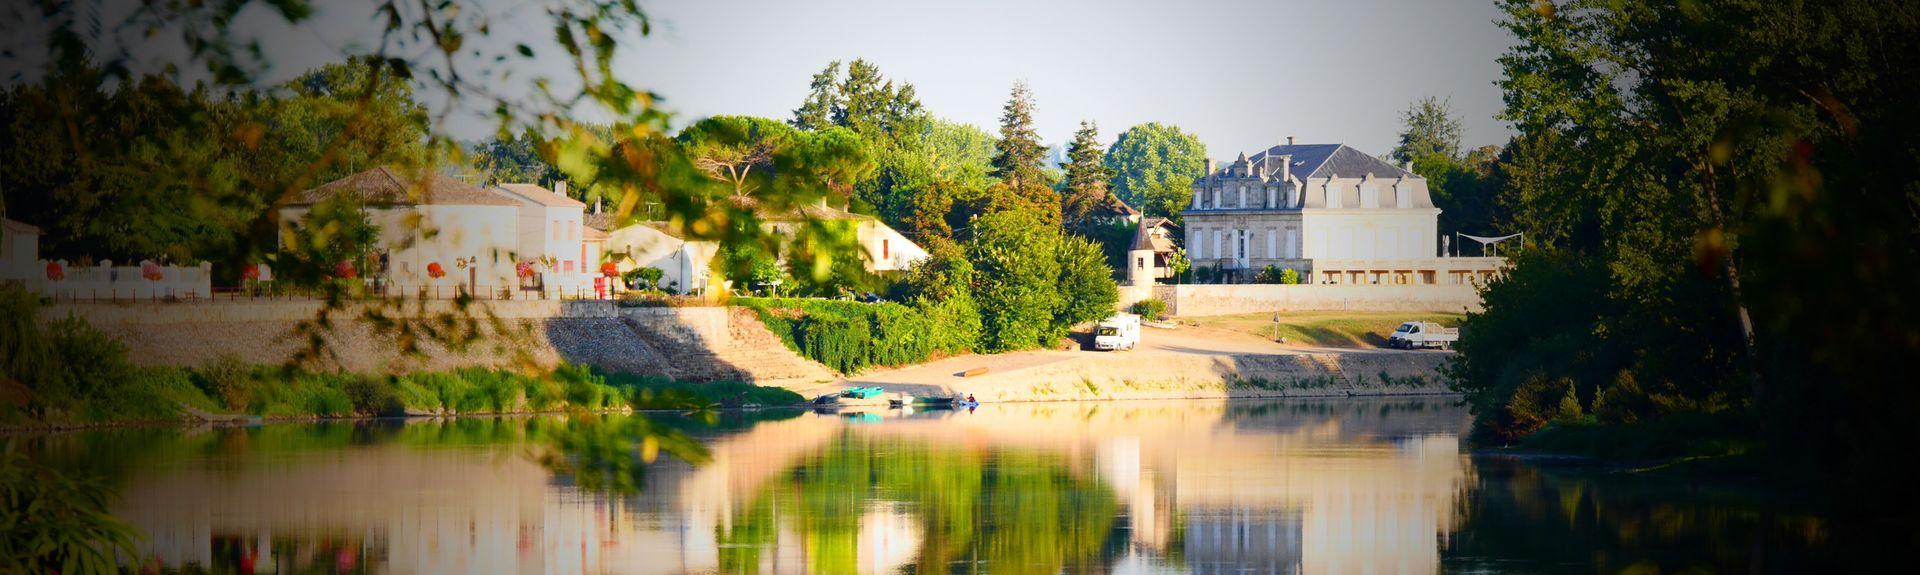 Station Caudrot, Caudrot, Aquitaine-Limousin-Poitou-Charentes, Frankrijk